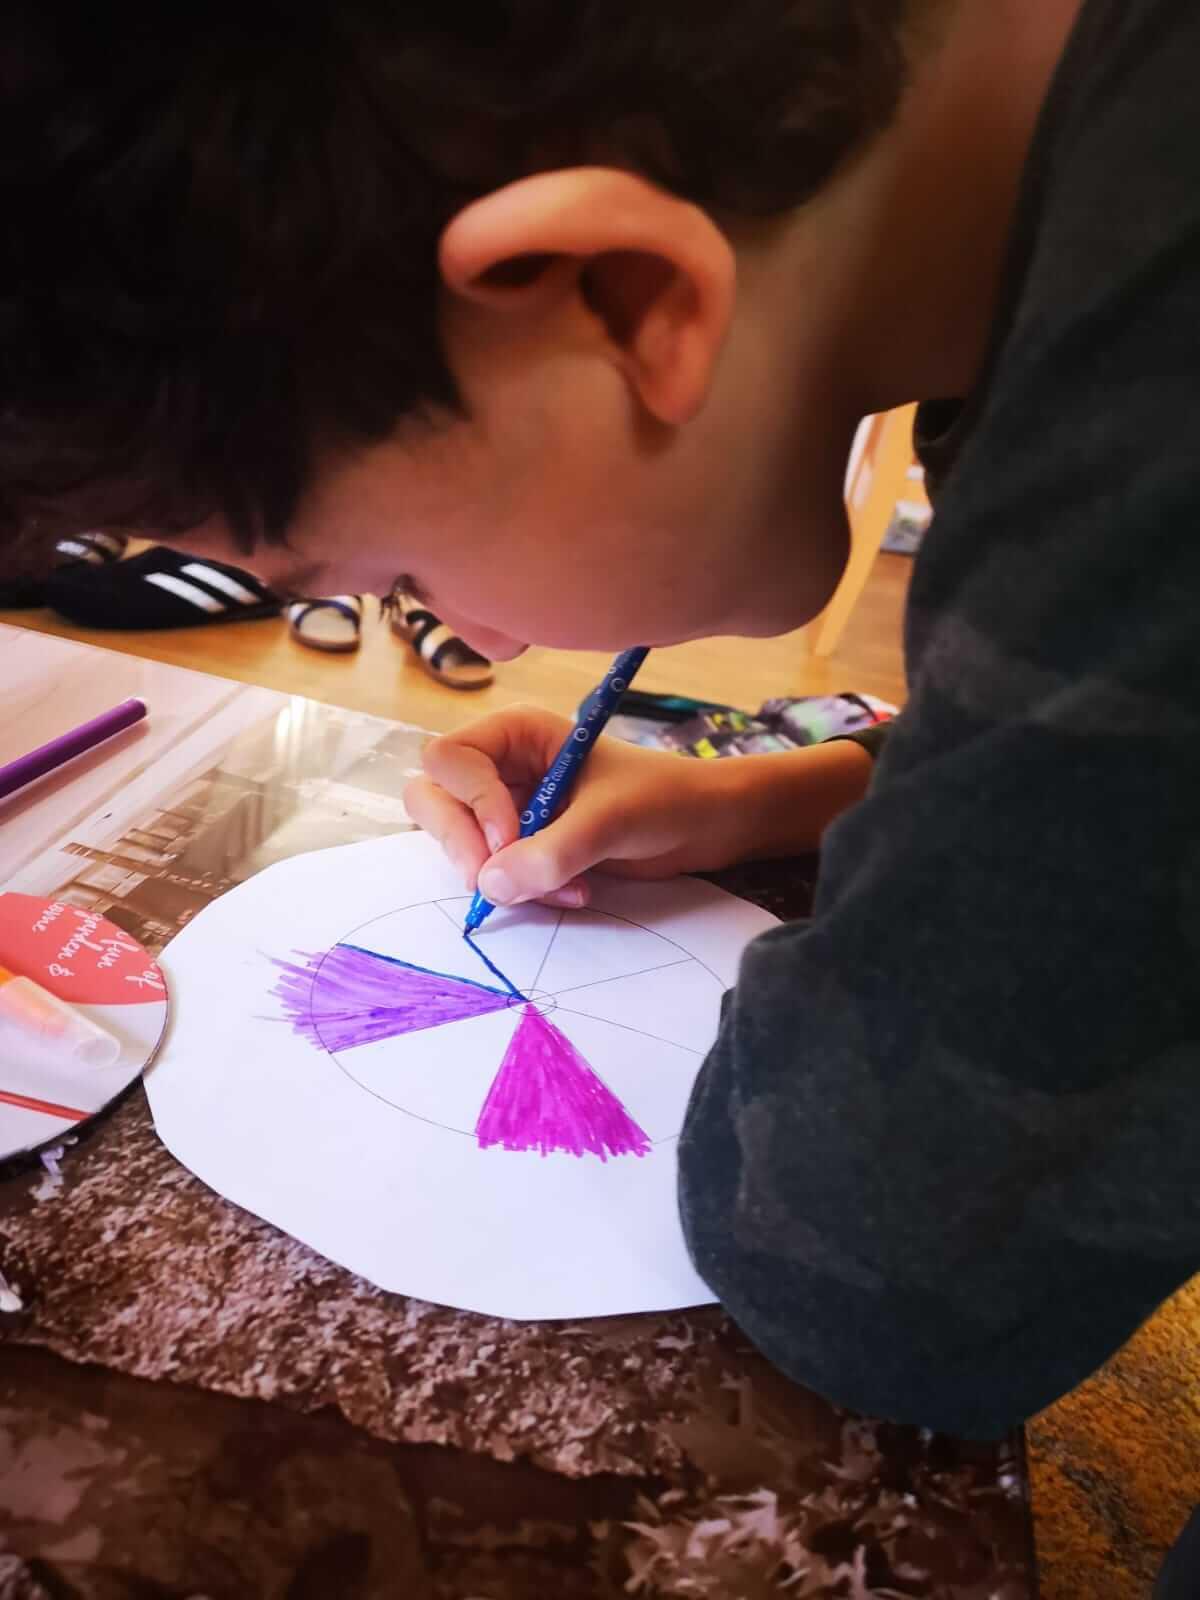 Two boys explore craft under lockdown.